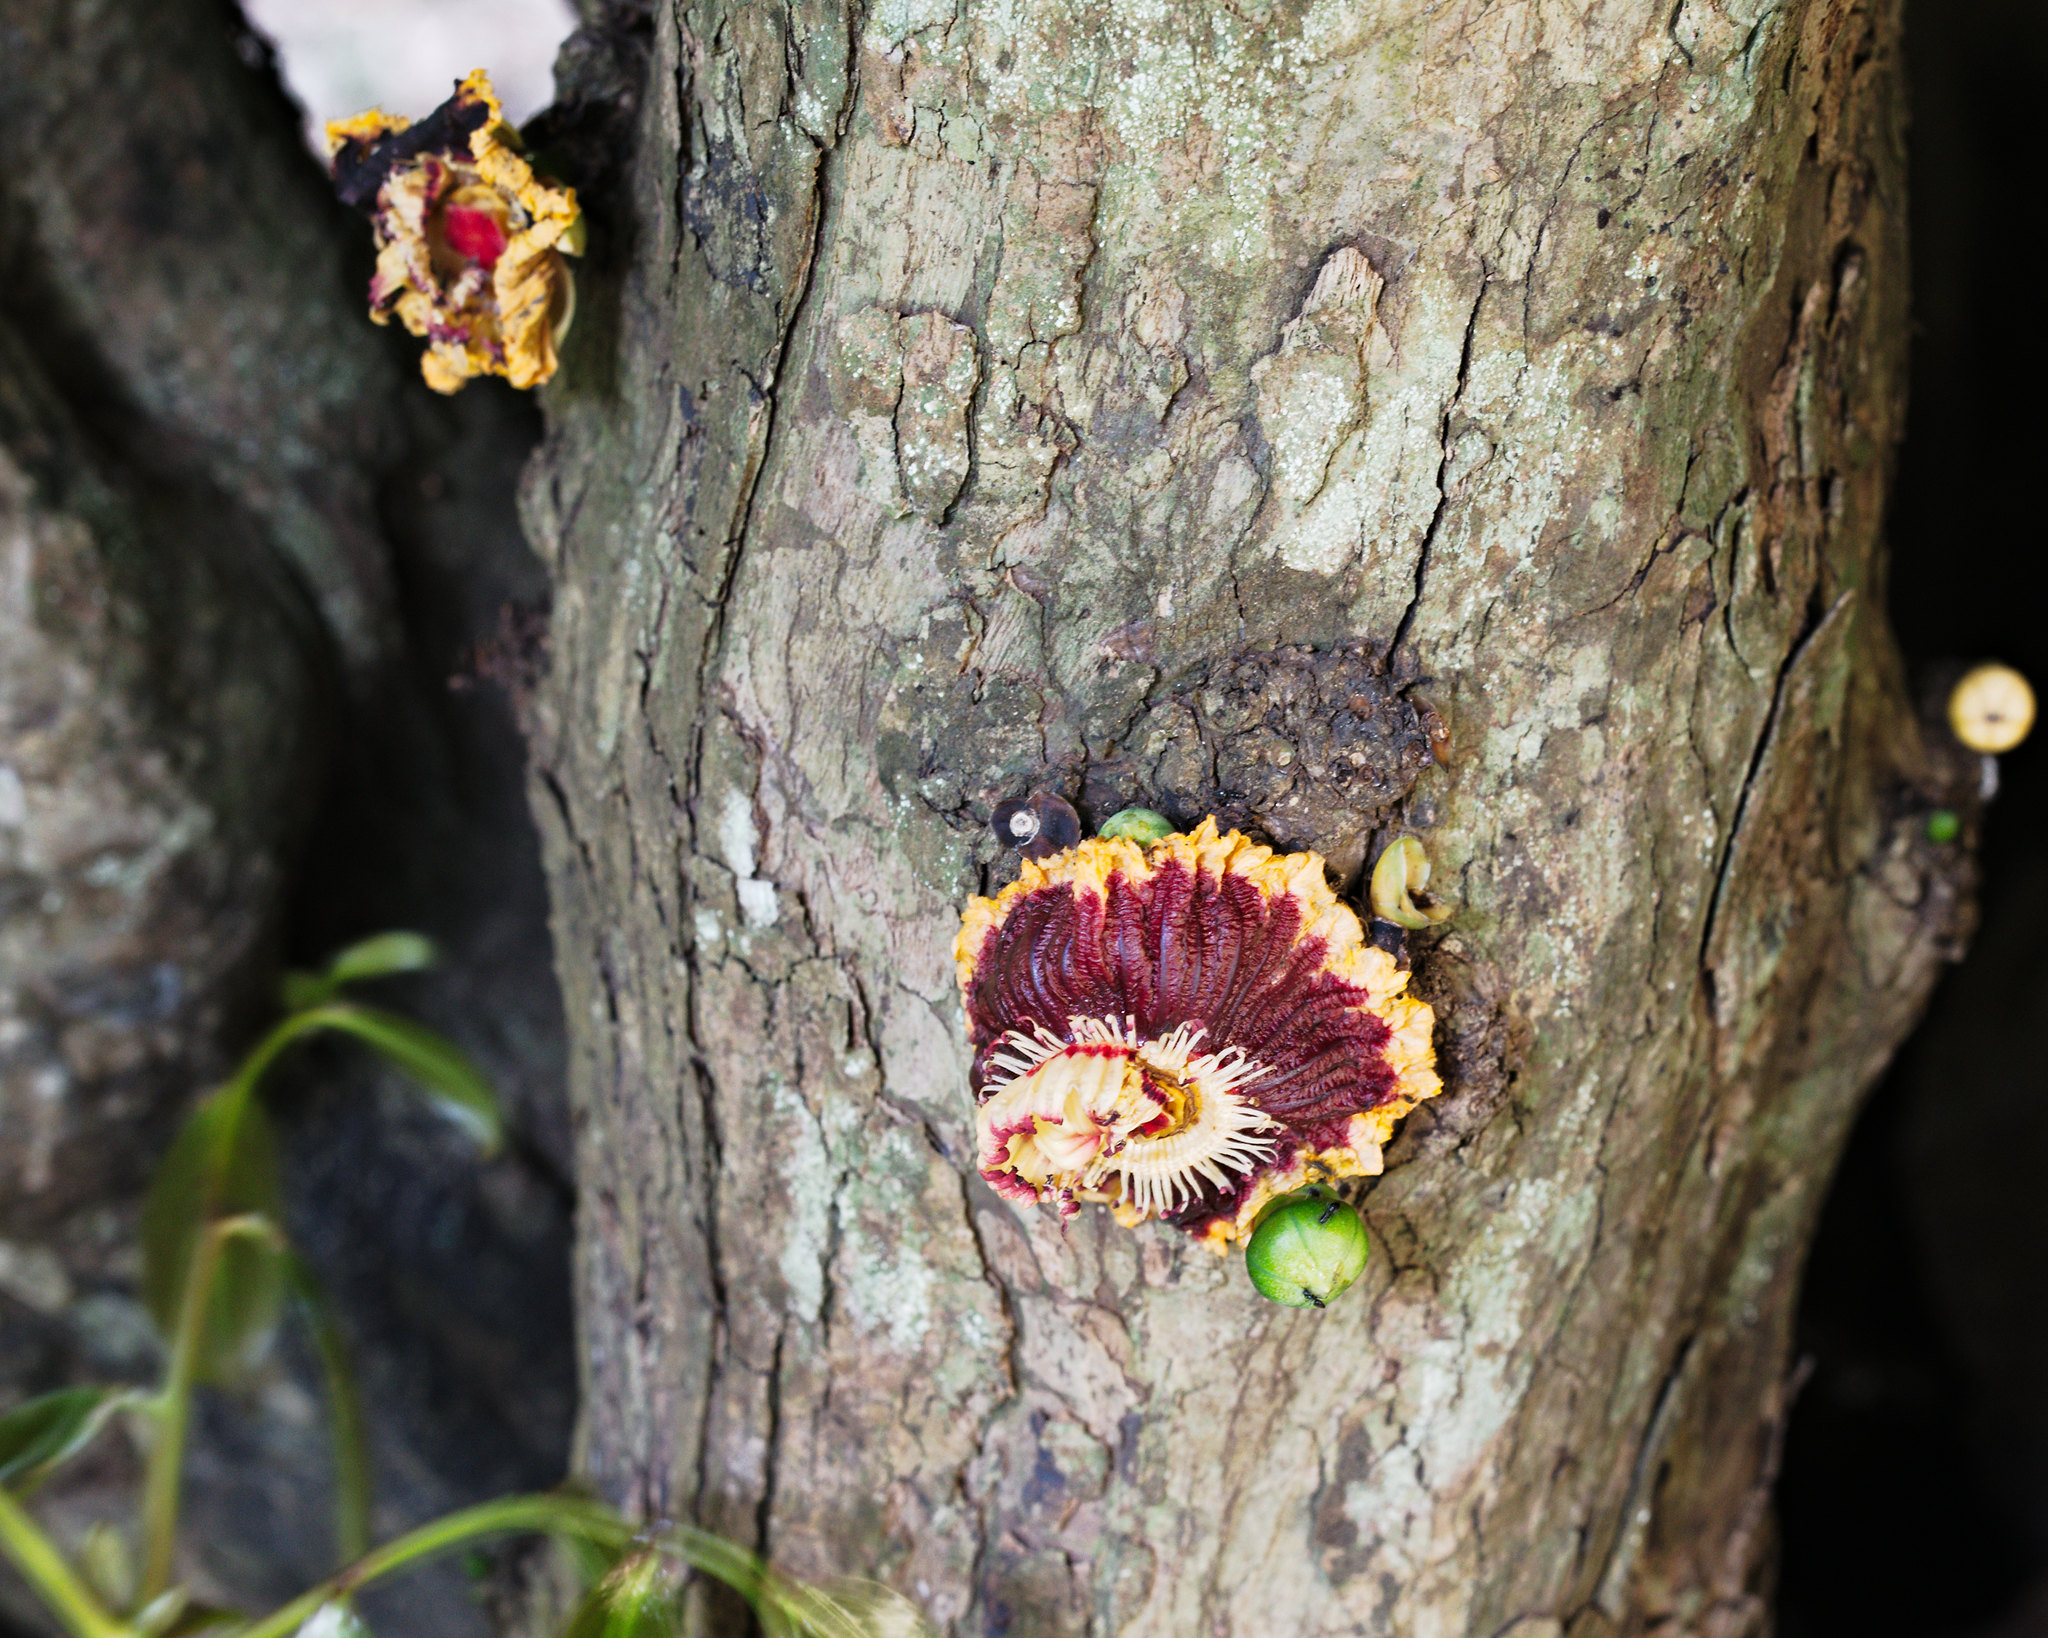 Napoleona Imperialis Napoleons Crown Flower On Tree Trunk